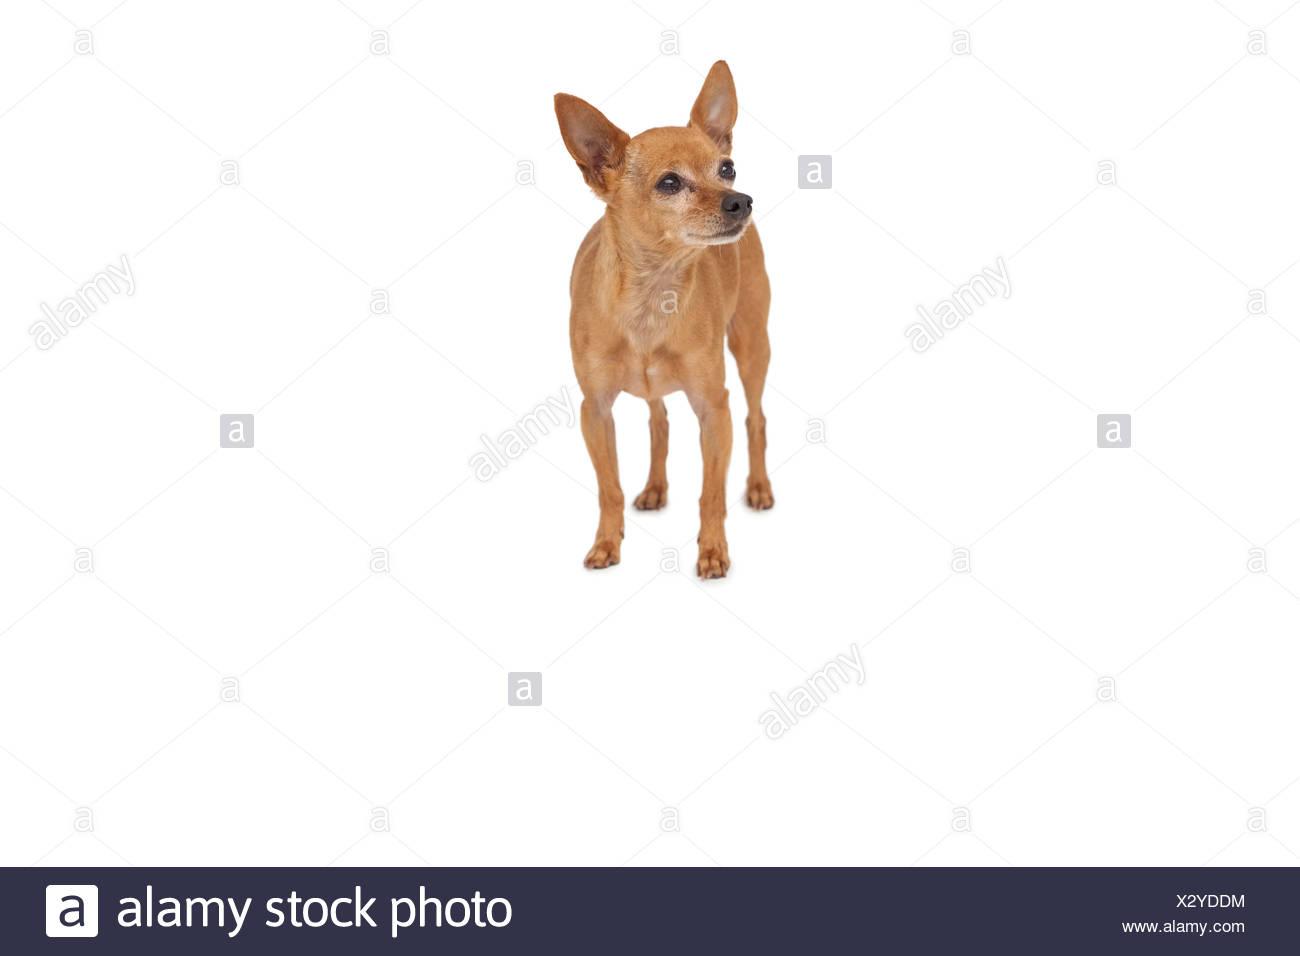 Full length of a pet dog Stock Photo